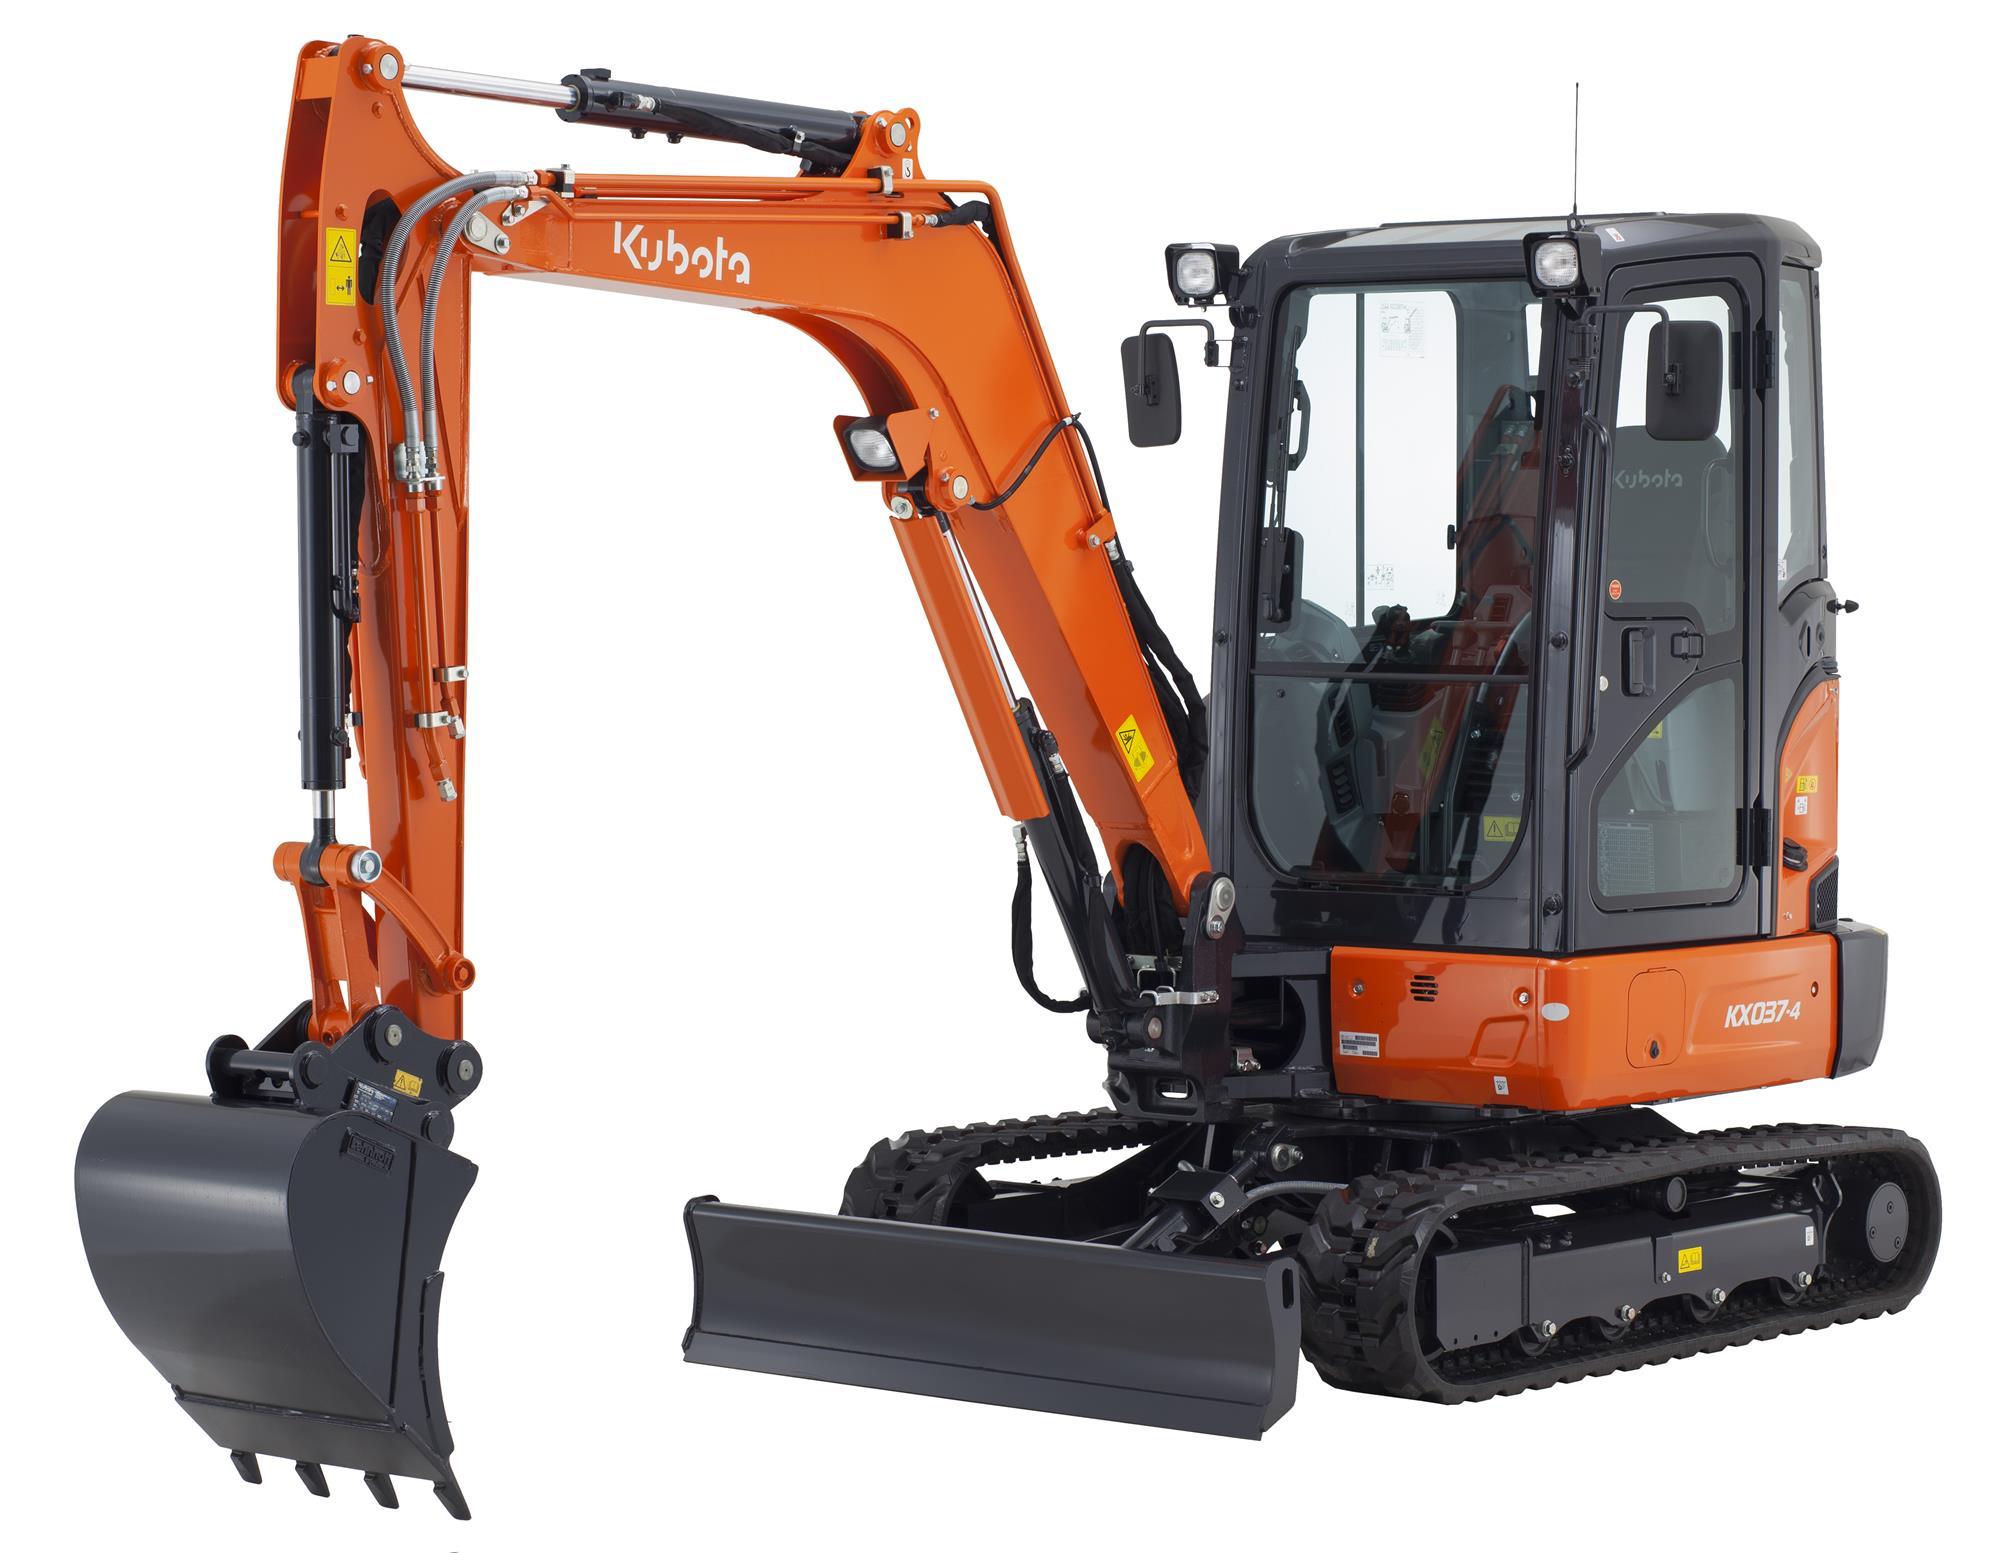 Kubota a lansat un nou mini excavator de 3,7 tone